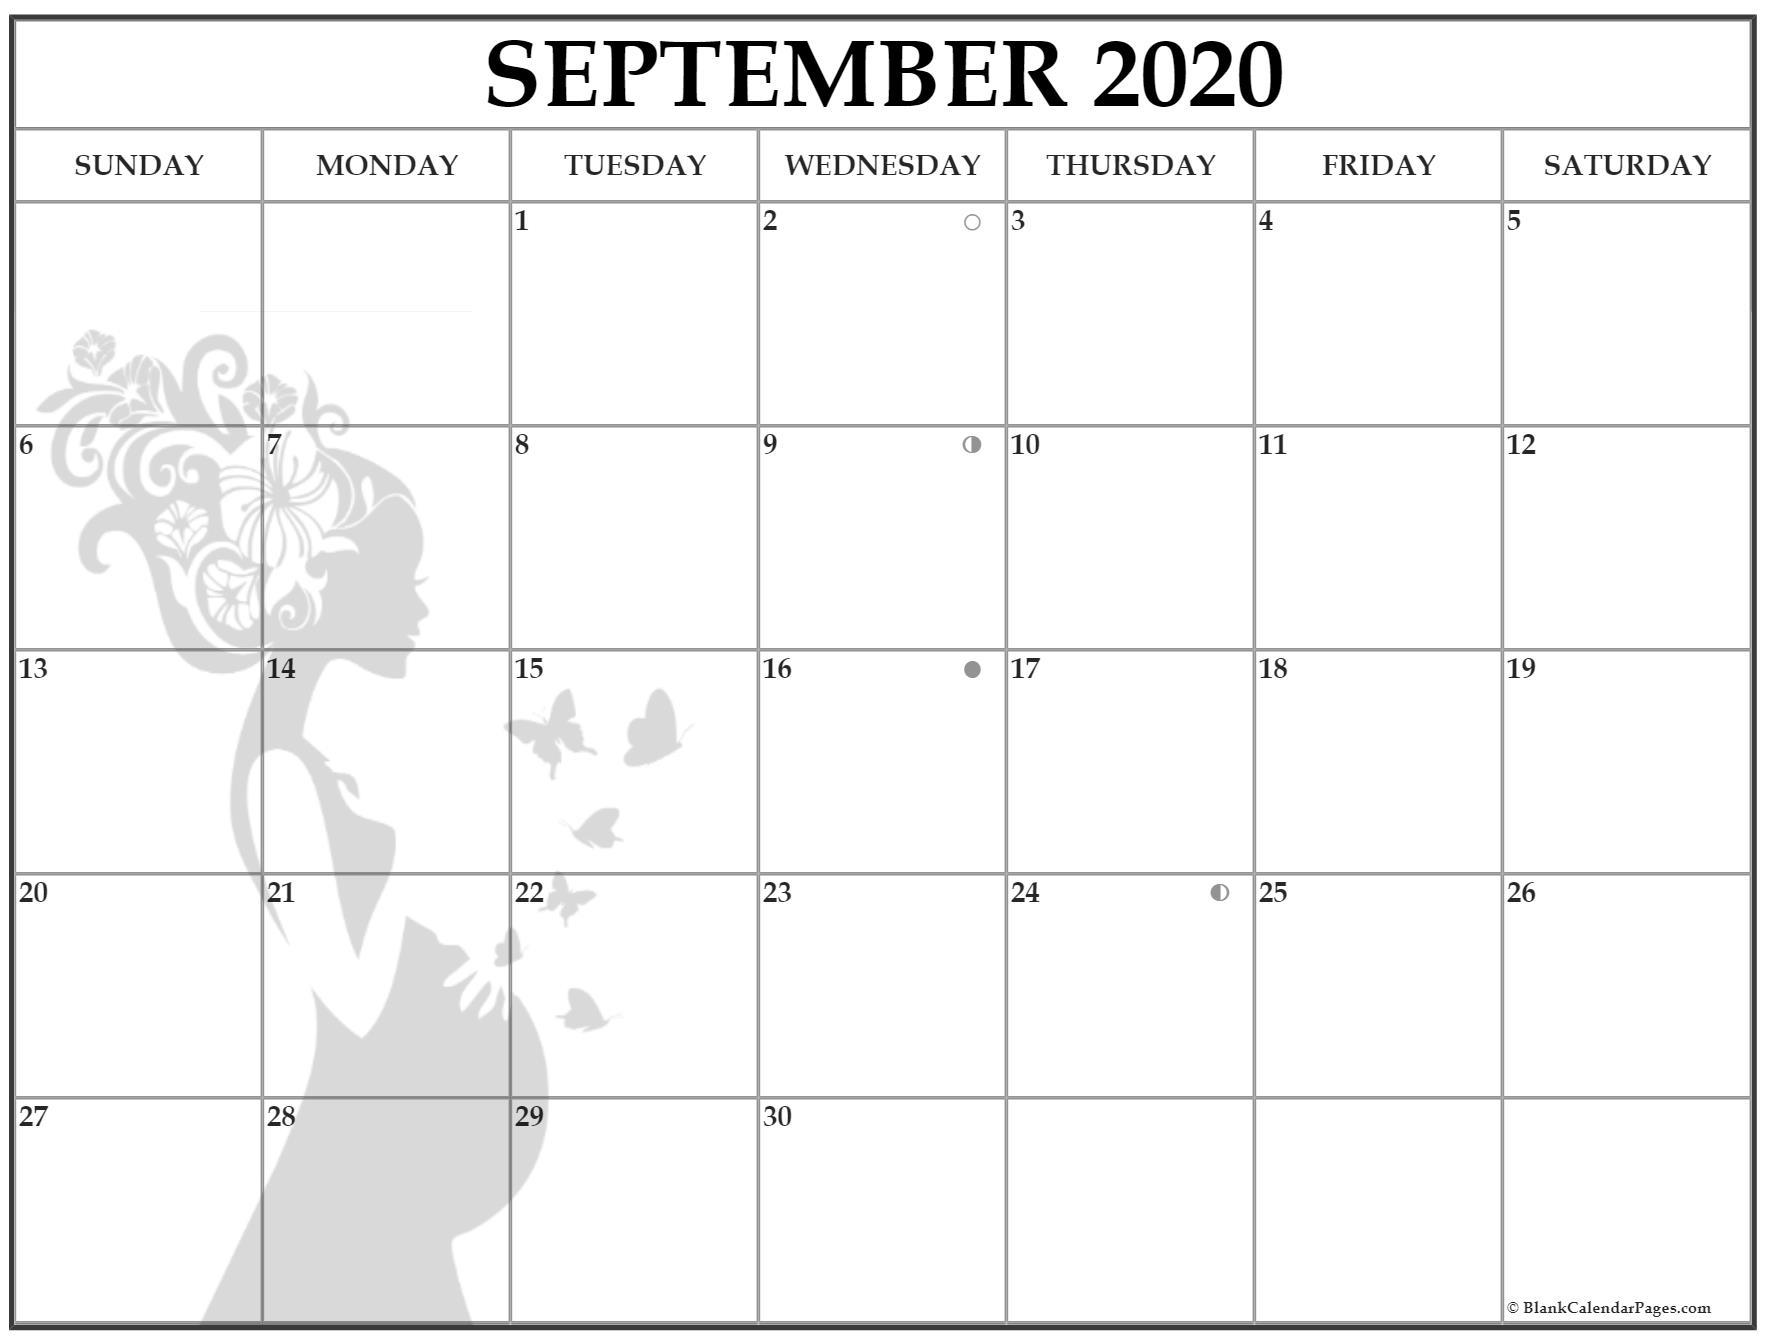 September 2020 Pregnancy Calendar | Fertility Calendar